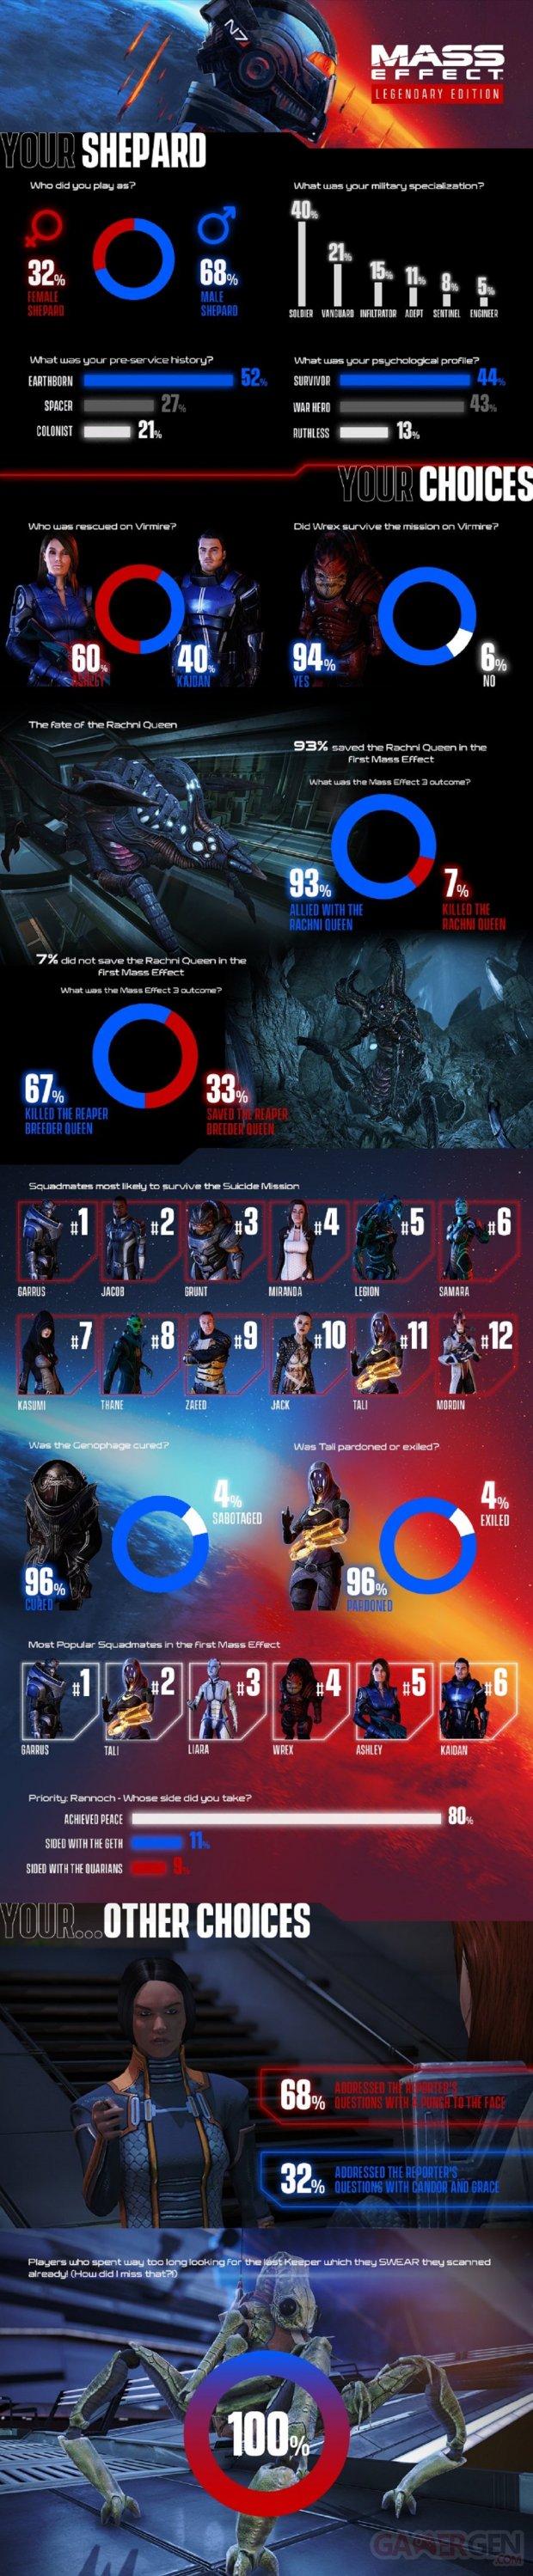 Mass Effect Édition Légendaire Infographie Stats